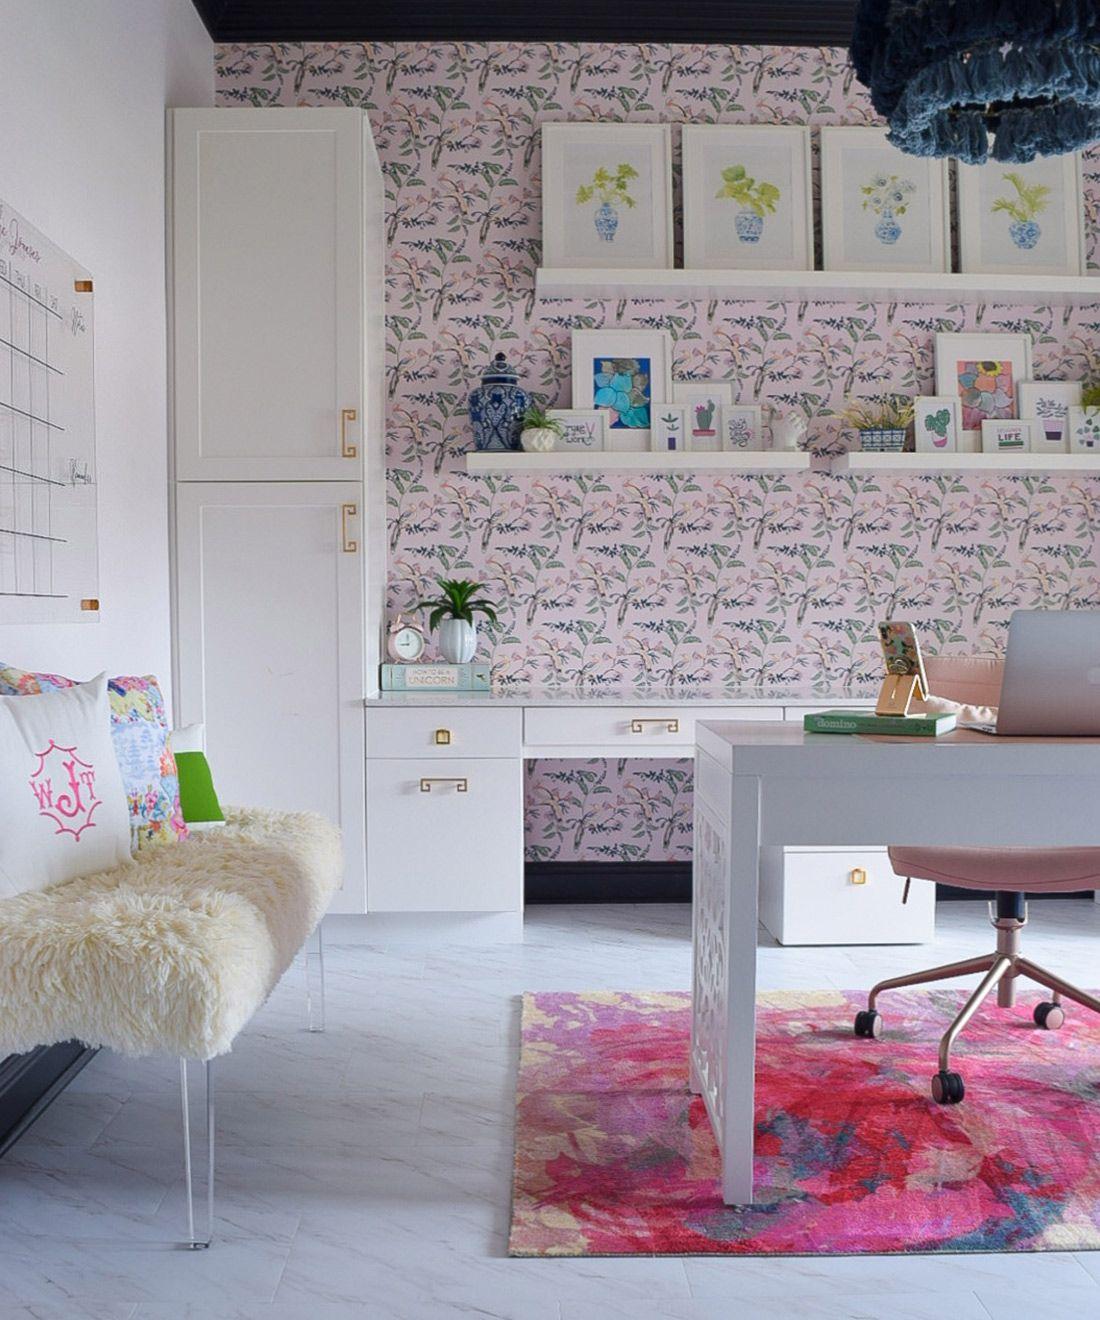 Birds of Paradise • Home Office Wallpaper •We're The Joneses •One Room Challenge • Pink Wallpaper